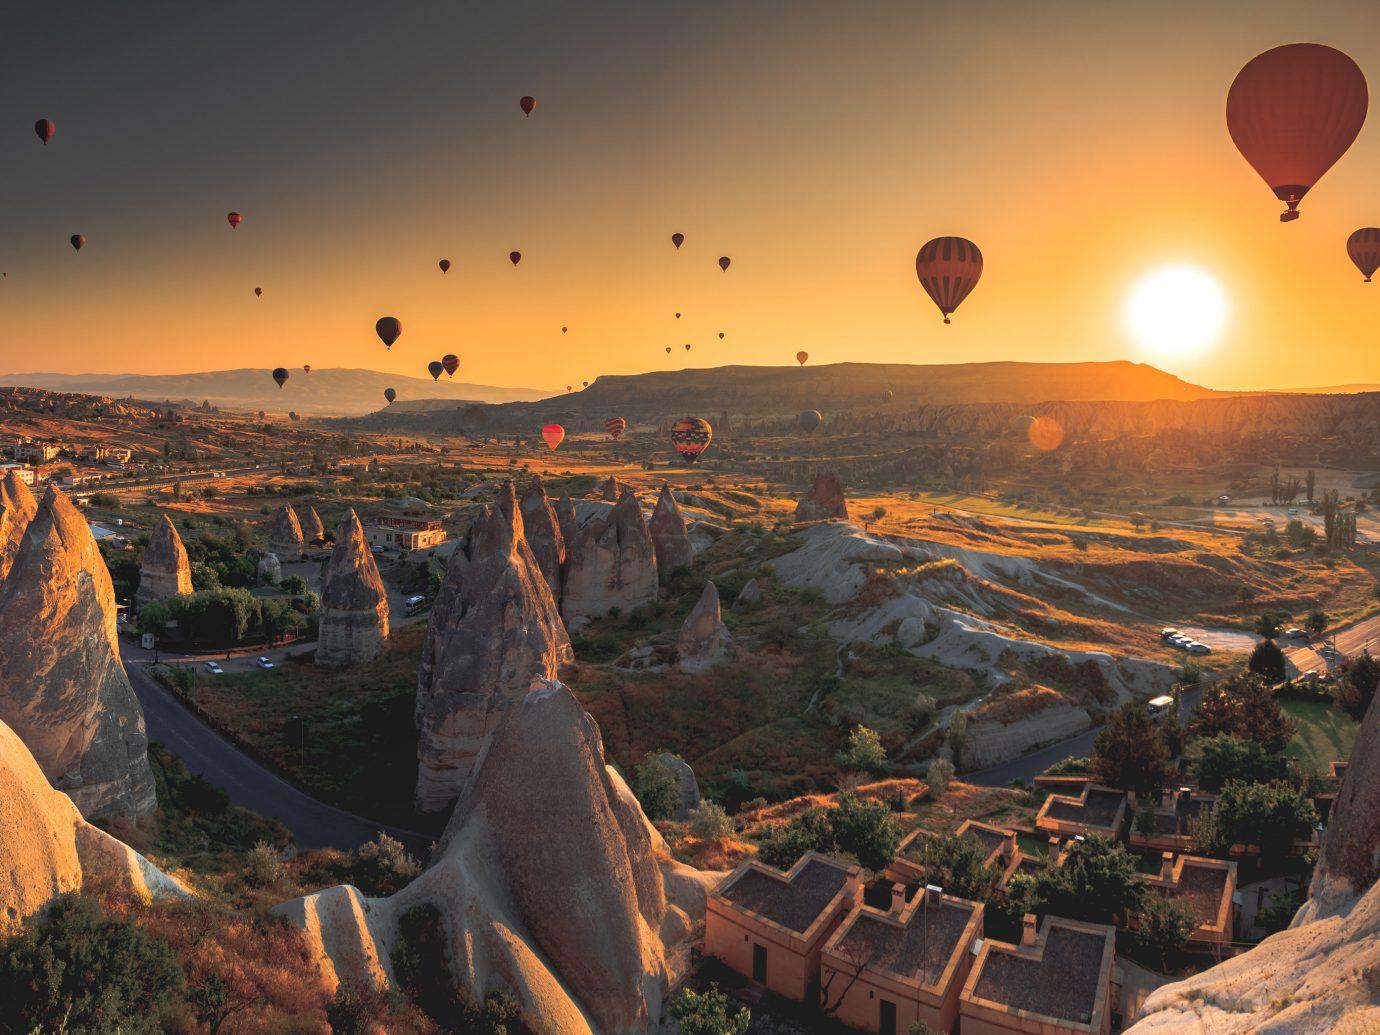 Budget Offbeat Trip Ideas sky outdoor canyon valley Nature Sunset vehicle aircraft Hot Air Balloon evening sunrise screenshot